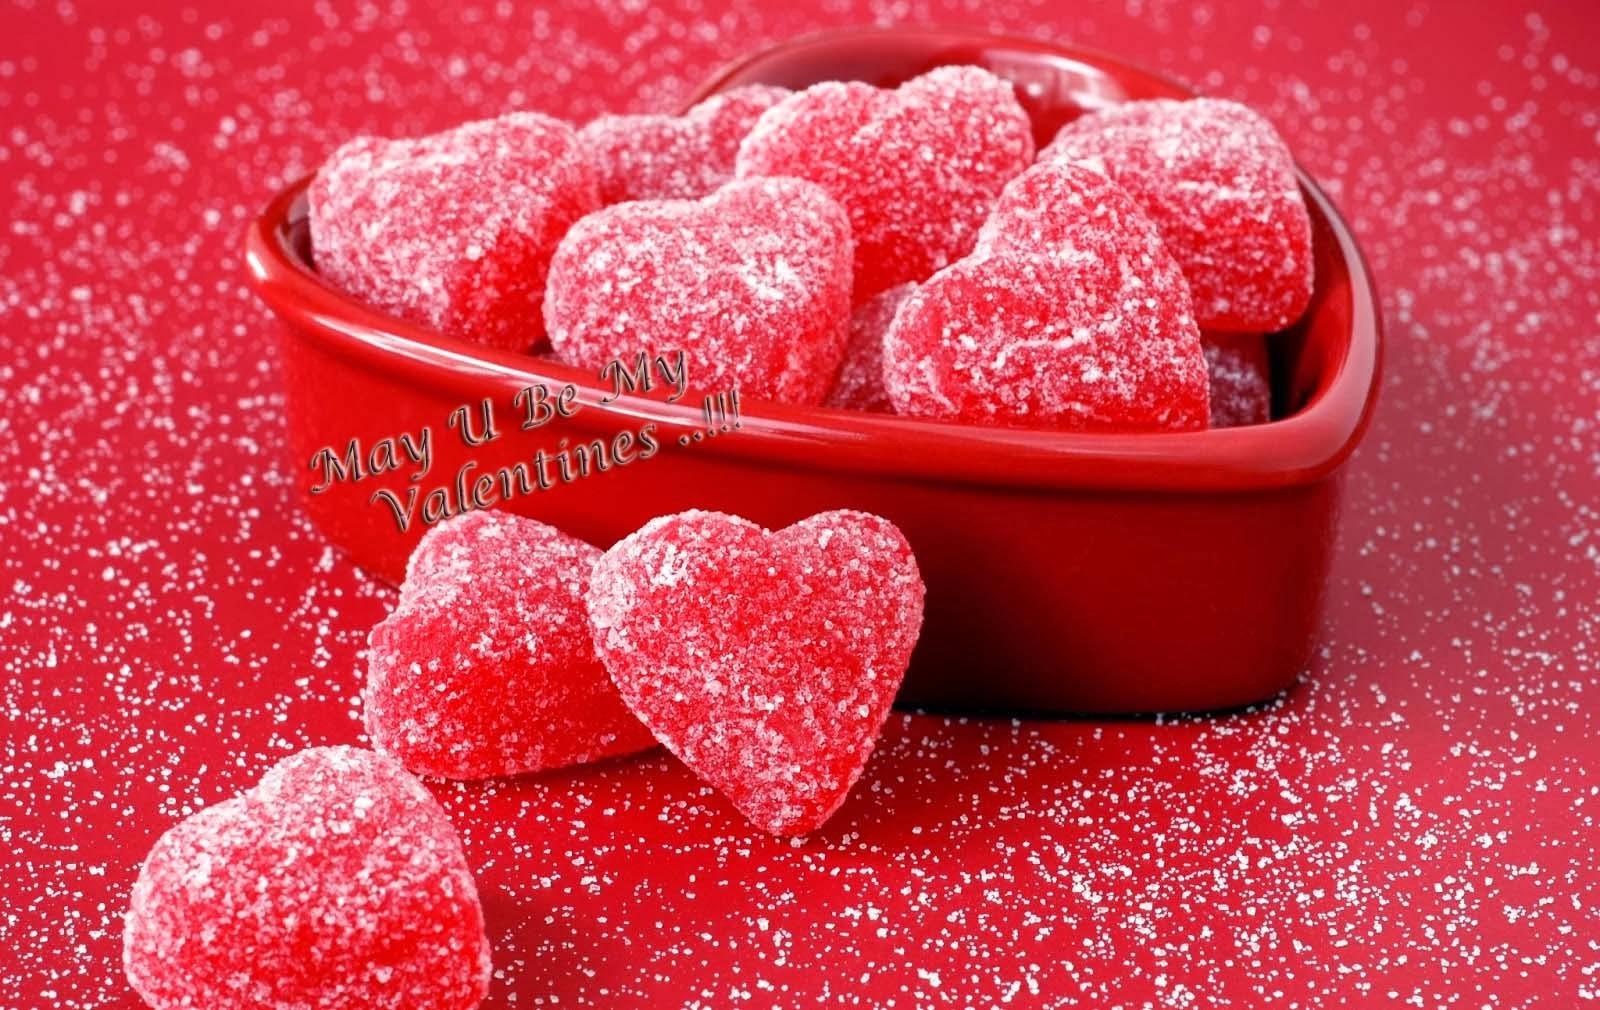 Valentines Day Love HD Wallpaper 1600x1010